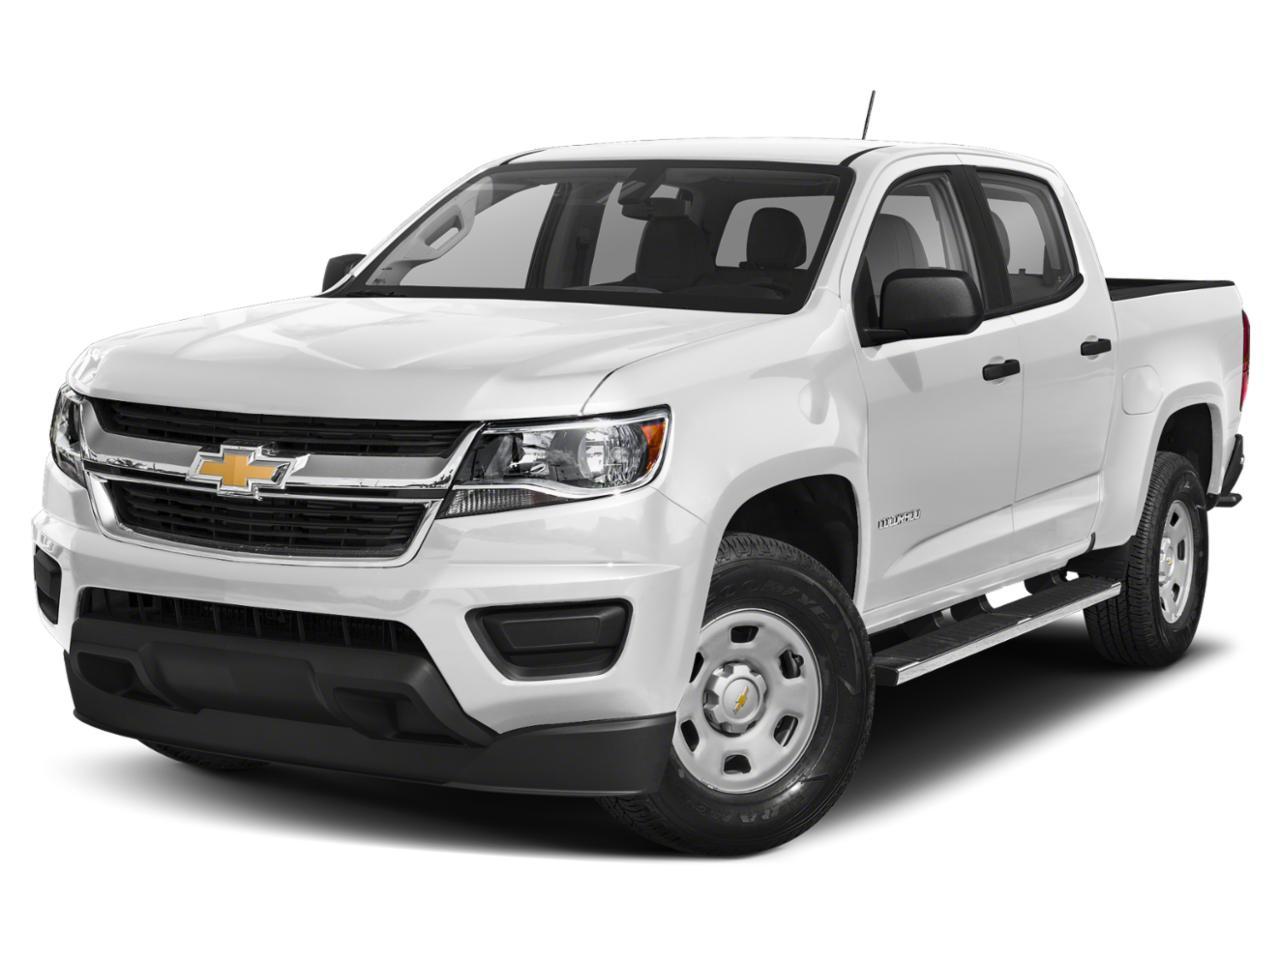 2019 Chevrolet Colorado Vehicle Photo in Odessa, TX 79762